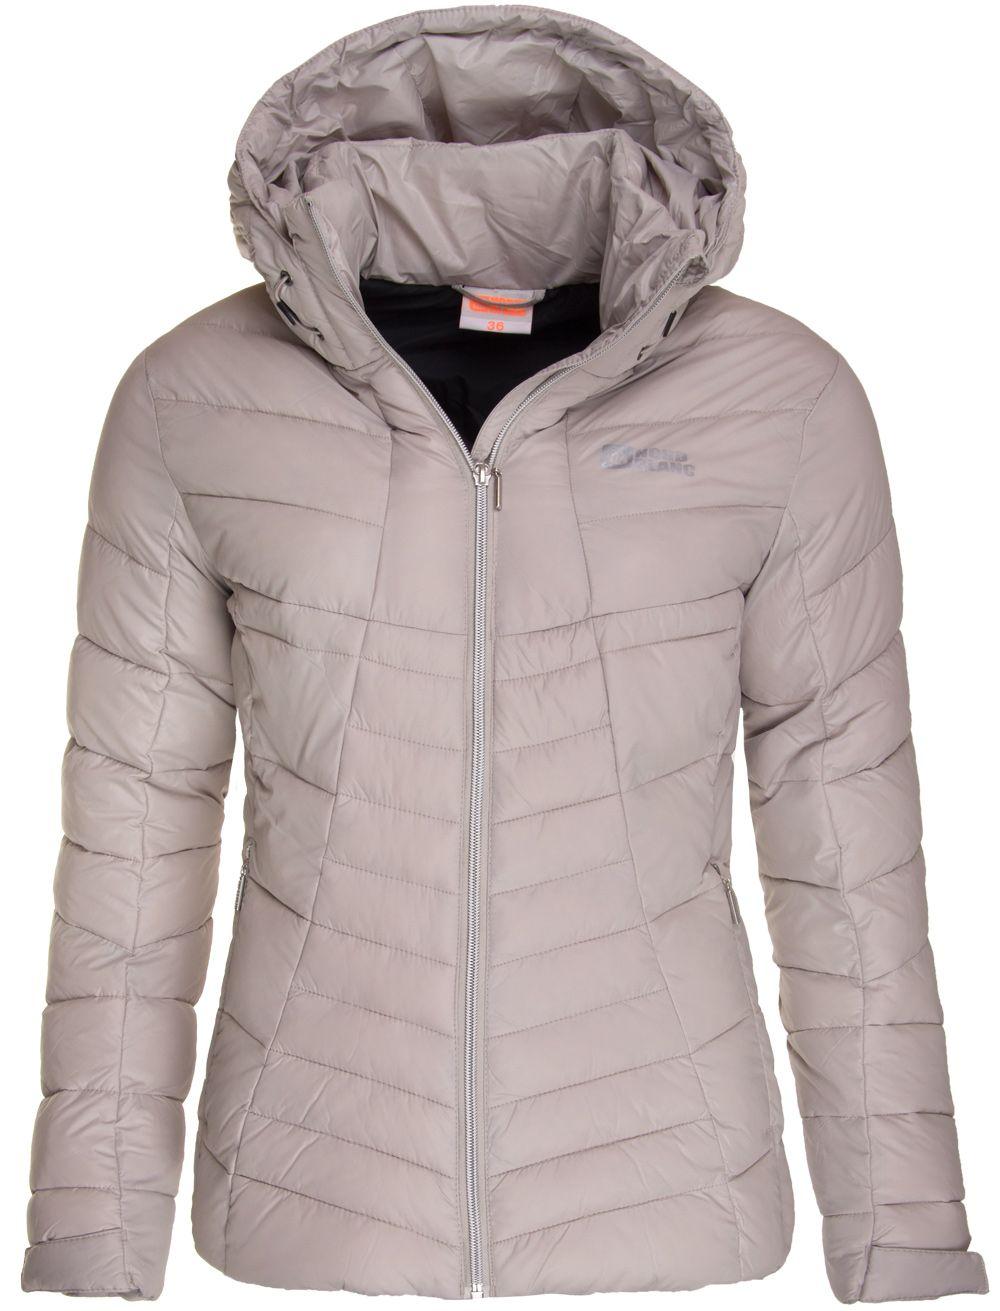 BezvaSport.cz - BezvaSport – Oblečení a obuv - Nord Blanc ad46196d231